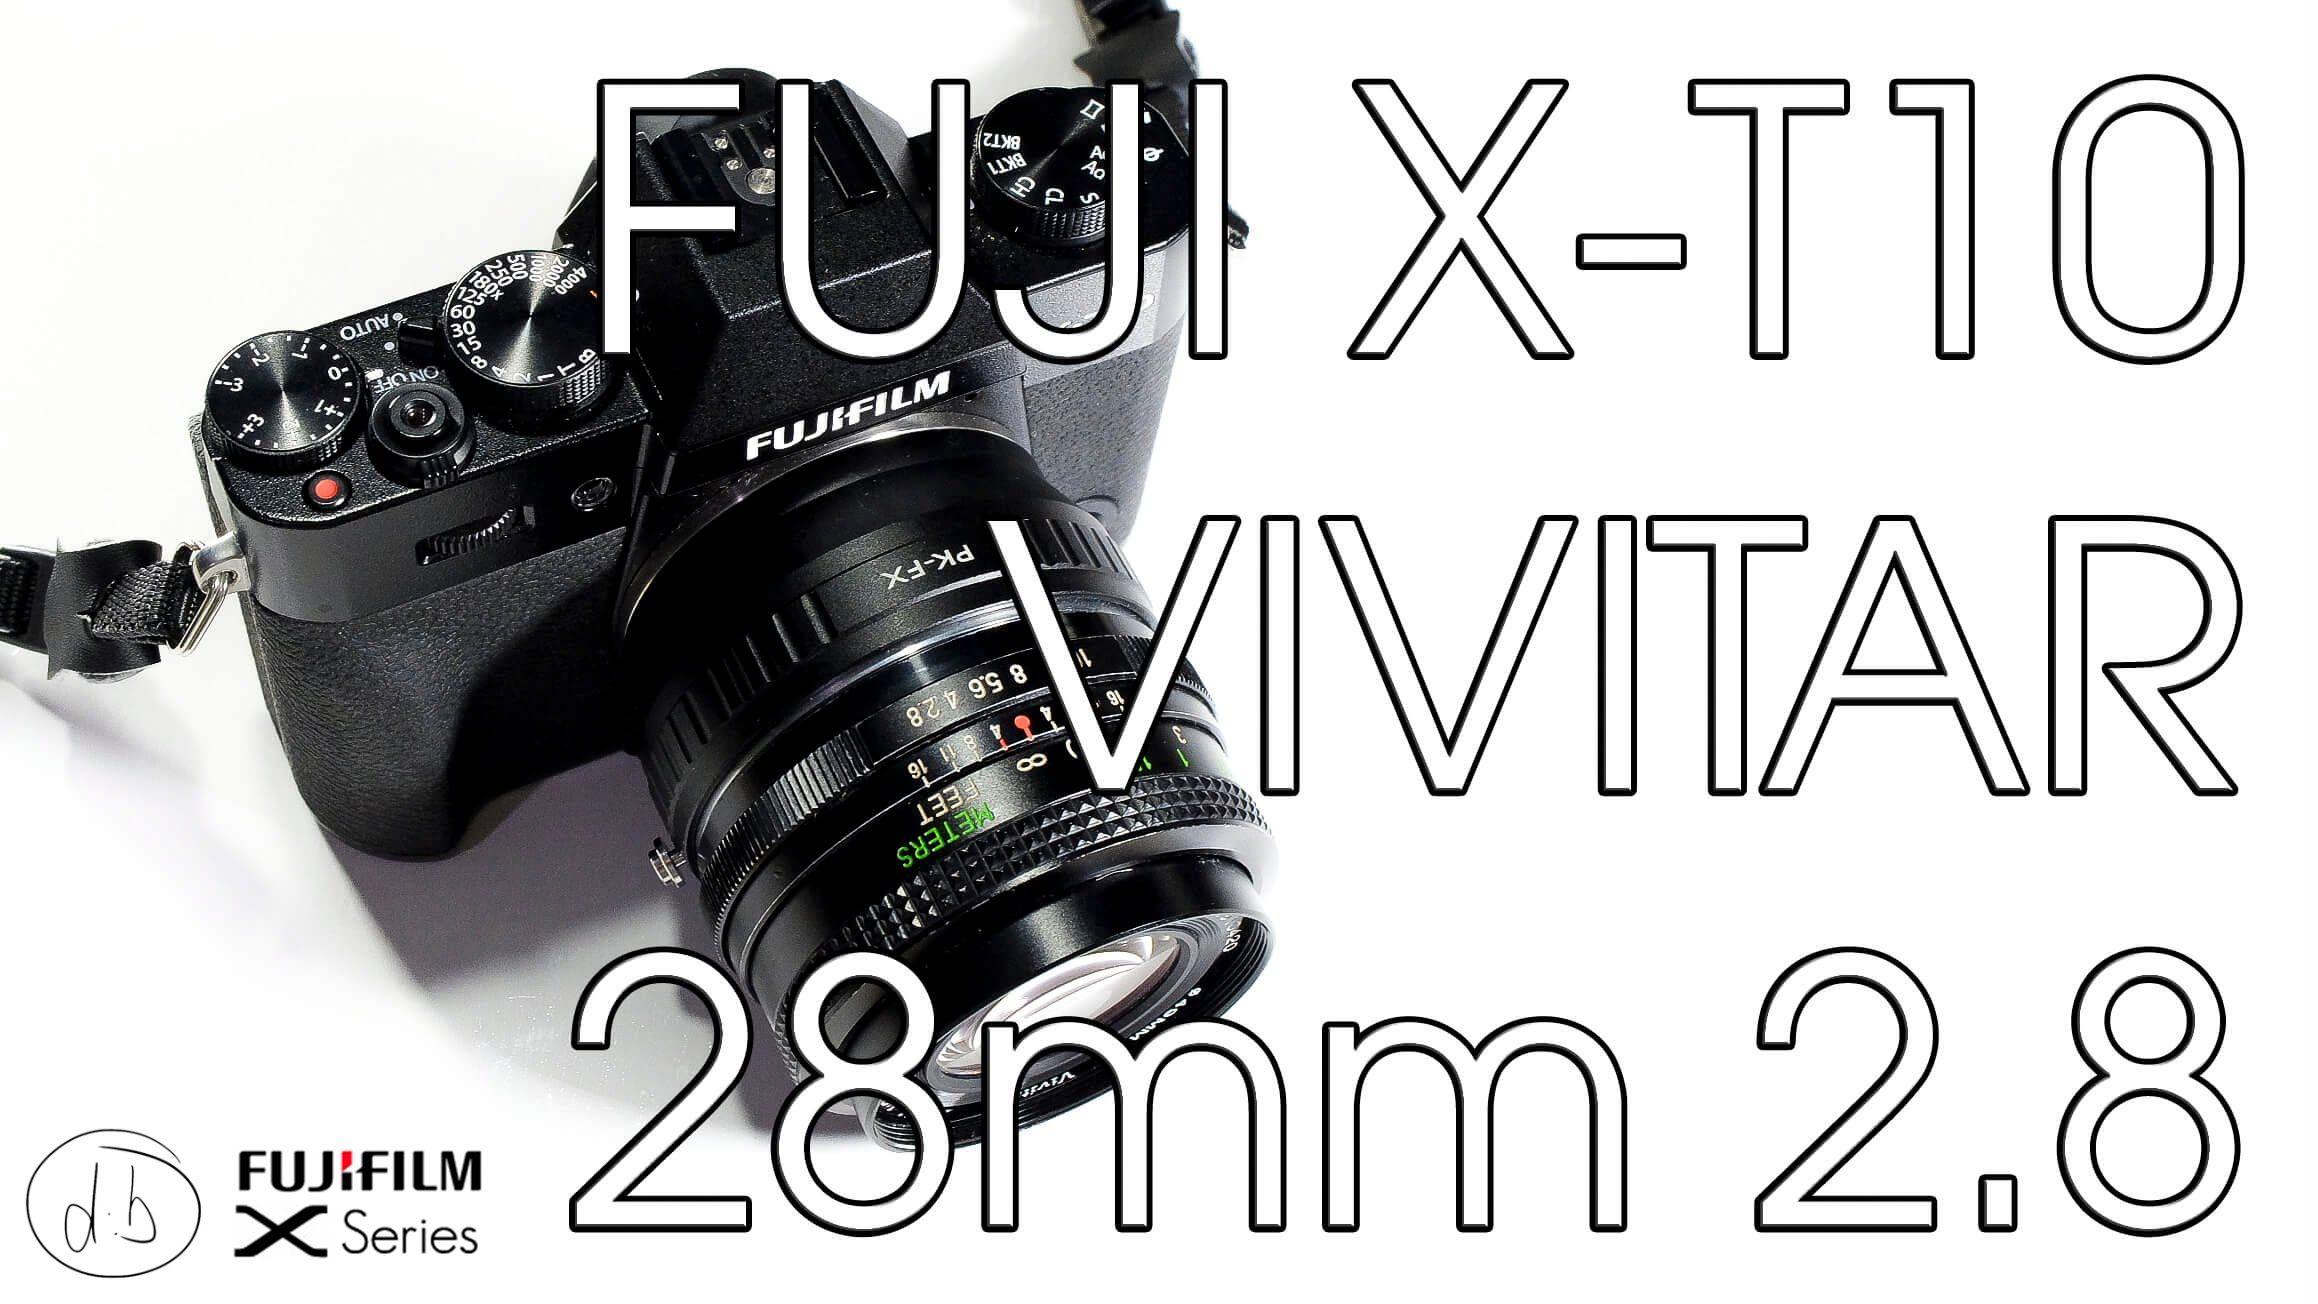 Fujifilm X T10 Vivitar 28mm F2 8 Vintage Lens Review Vintage Lenses Photography Gear Fujifilm